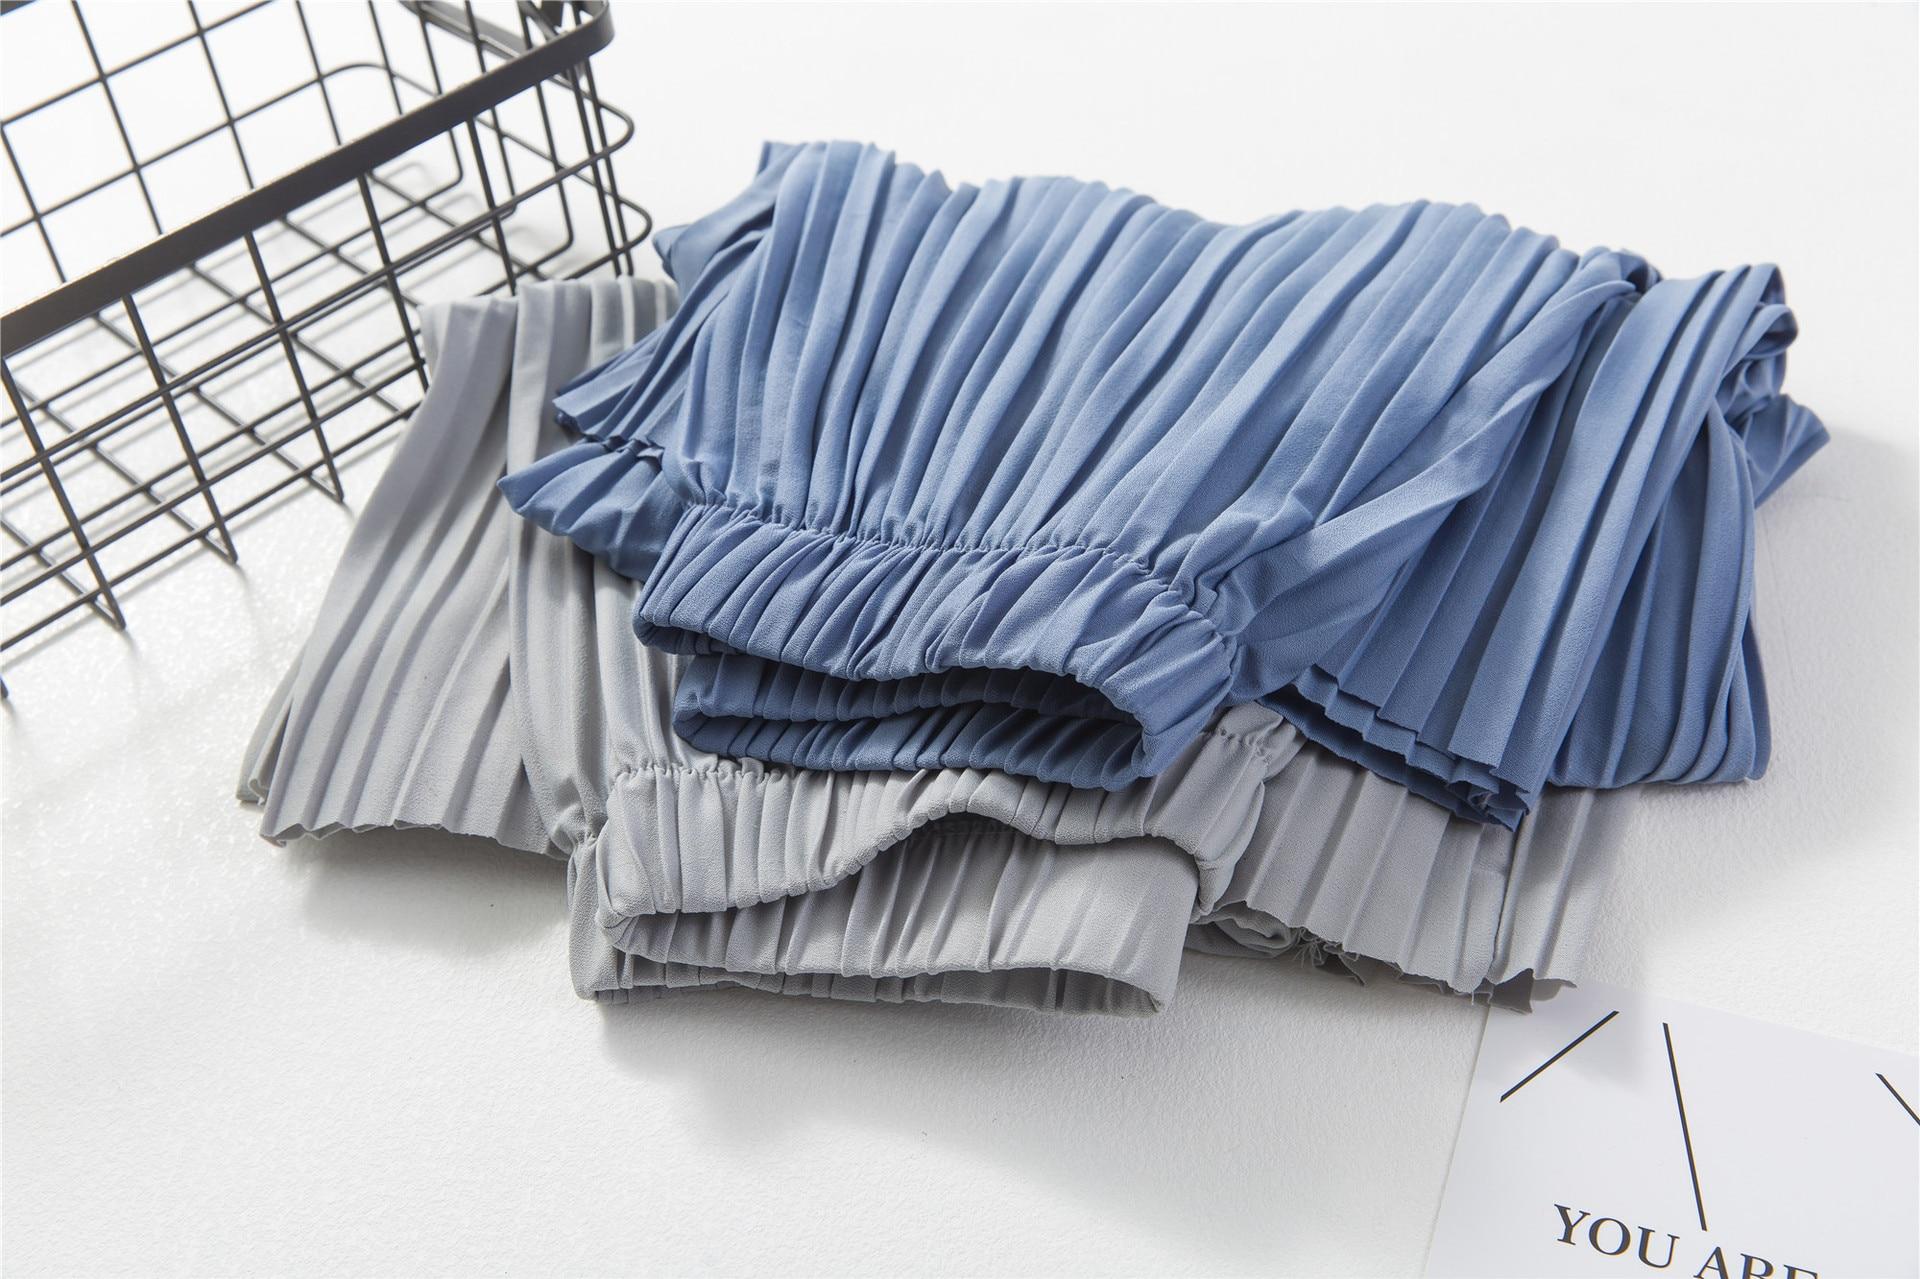 2017 Lebar Kaki Celana Pantalones Mujer Femme Ete Tinggi Pinggang Musim Panas wanita Celana Longgar 3 4 Celana Panjang Sutra Anchos De La Pierna Bell di